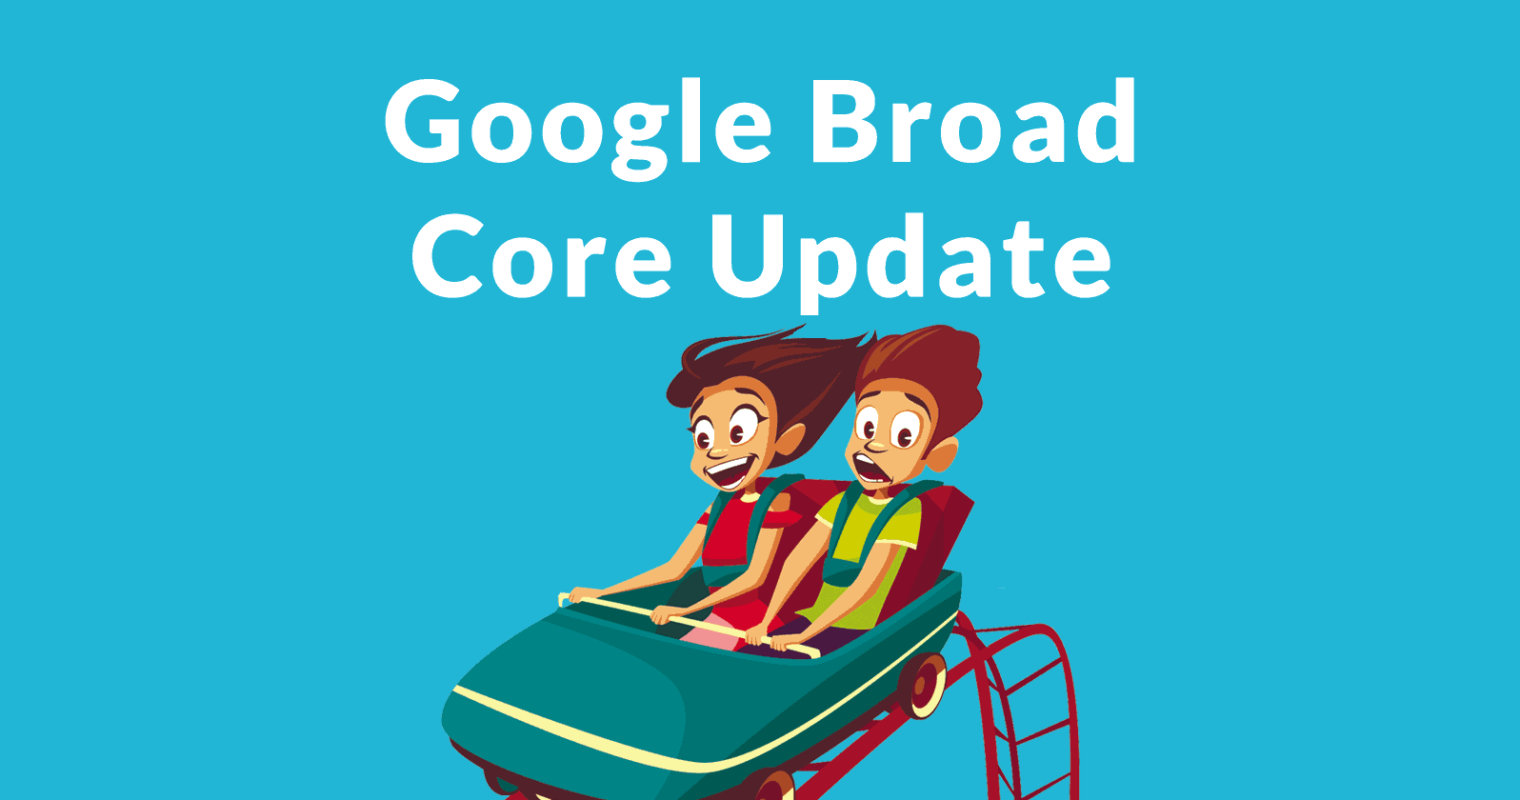 https://res.cloudinary.com/dpyy9uysx/image/upload/v1559537662/seo/june-broad-core-google-update.png